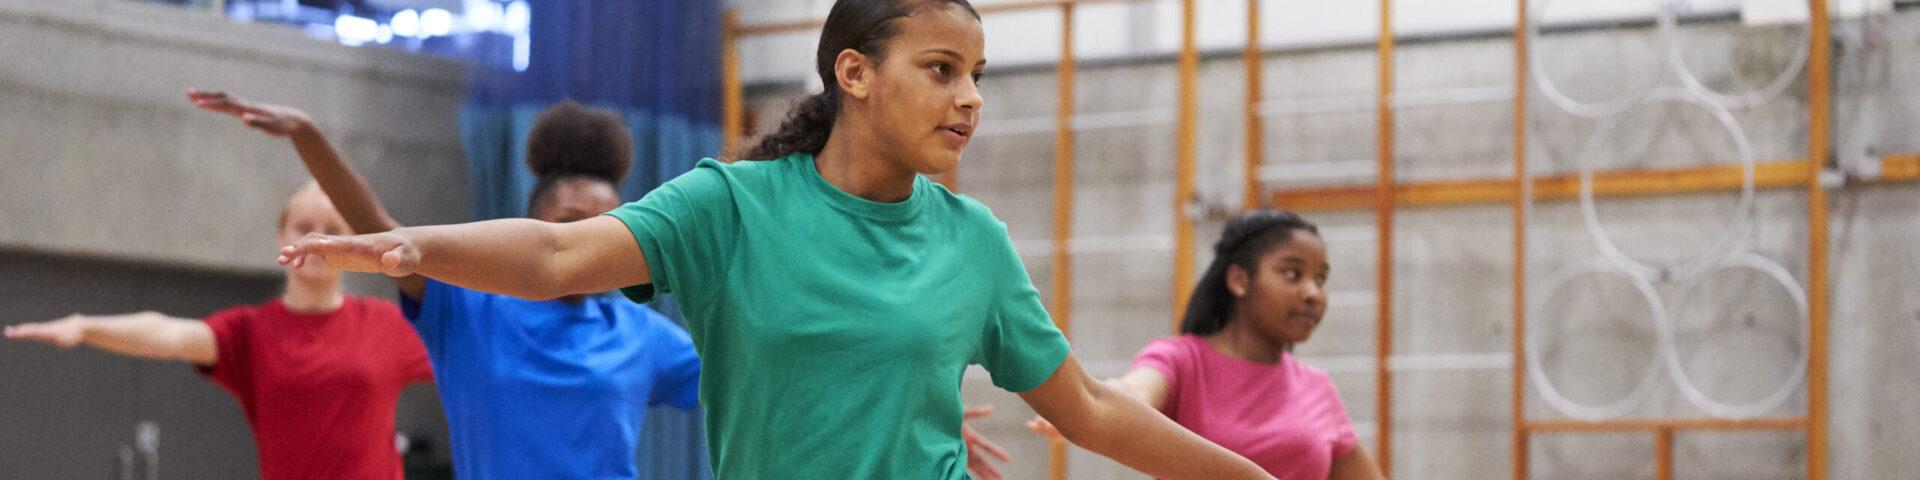 Girls dancing in a school gym